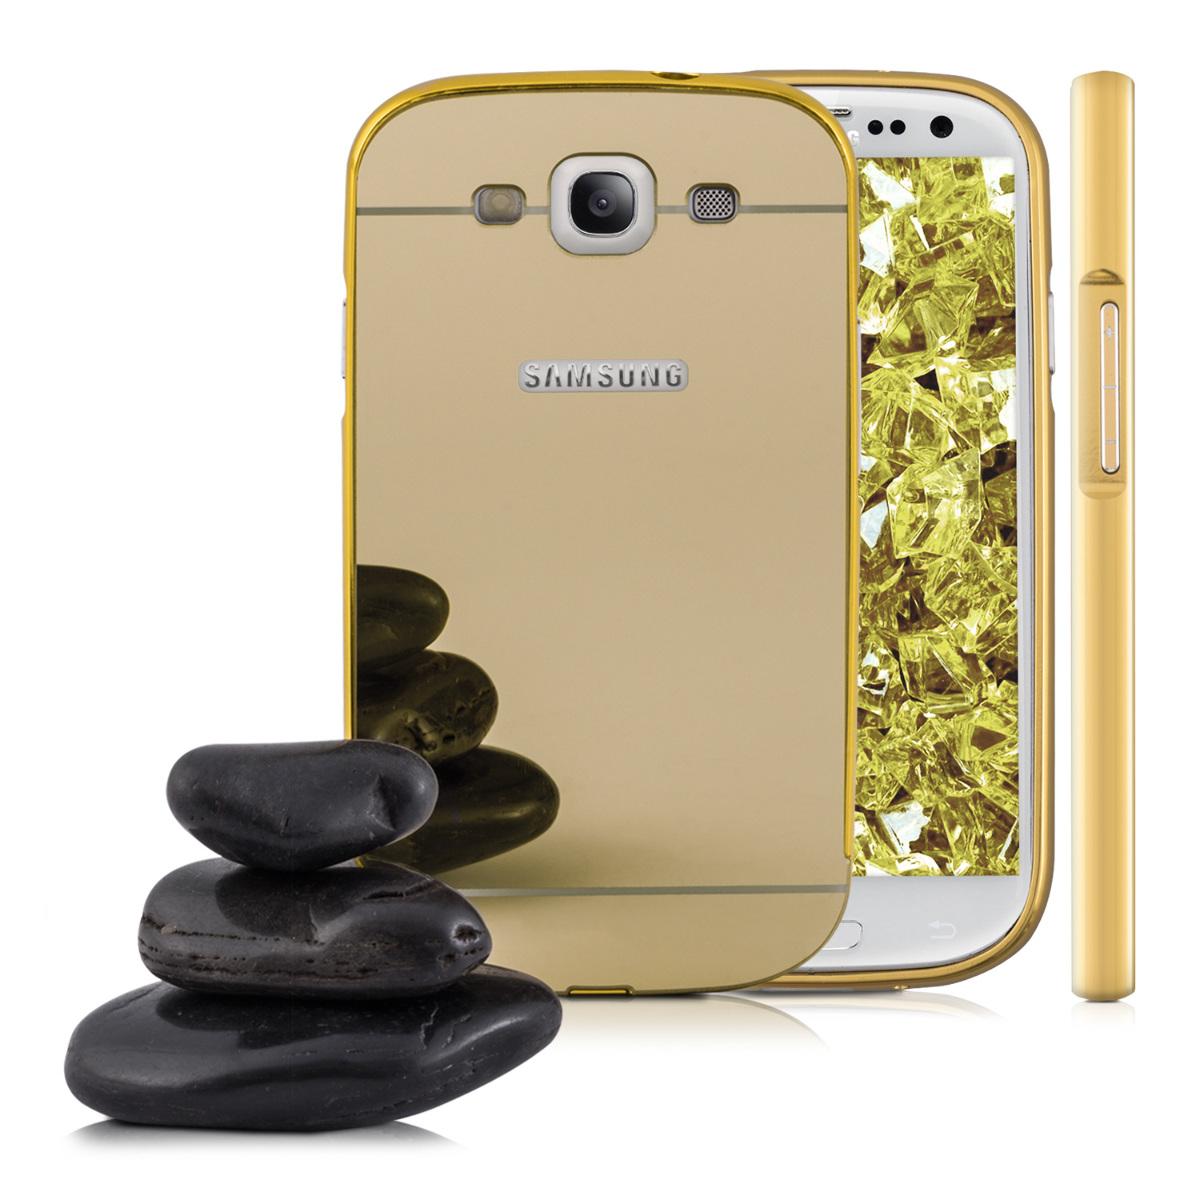 Telefoni cinesi buoni - Samsung dive italia ...